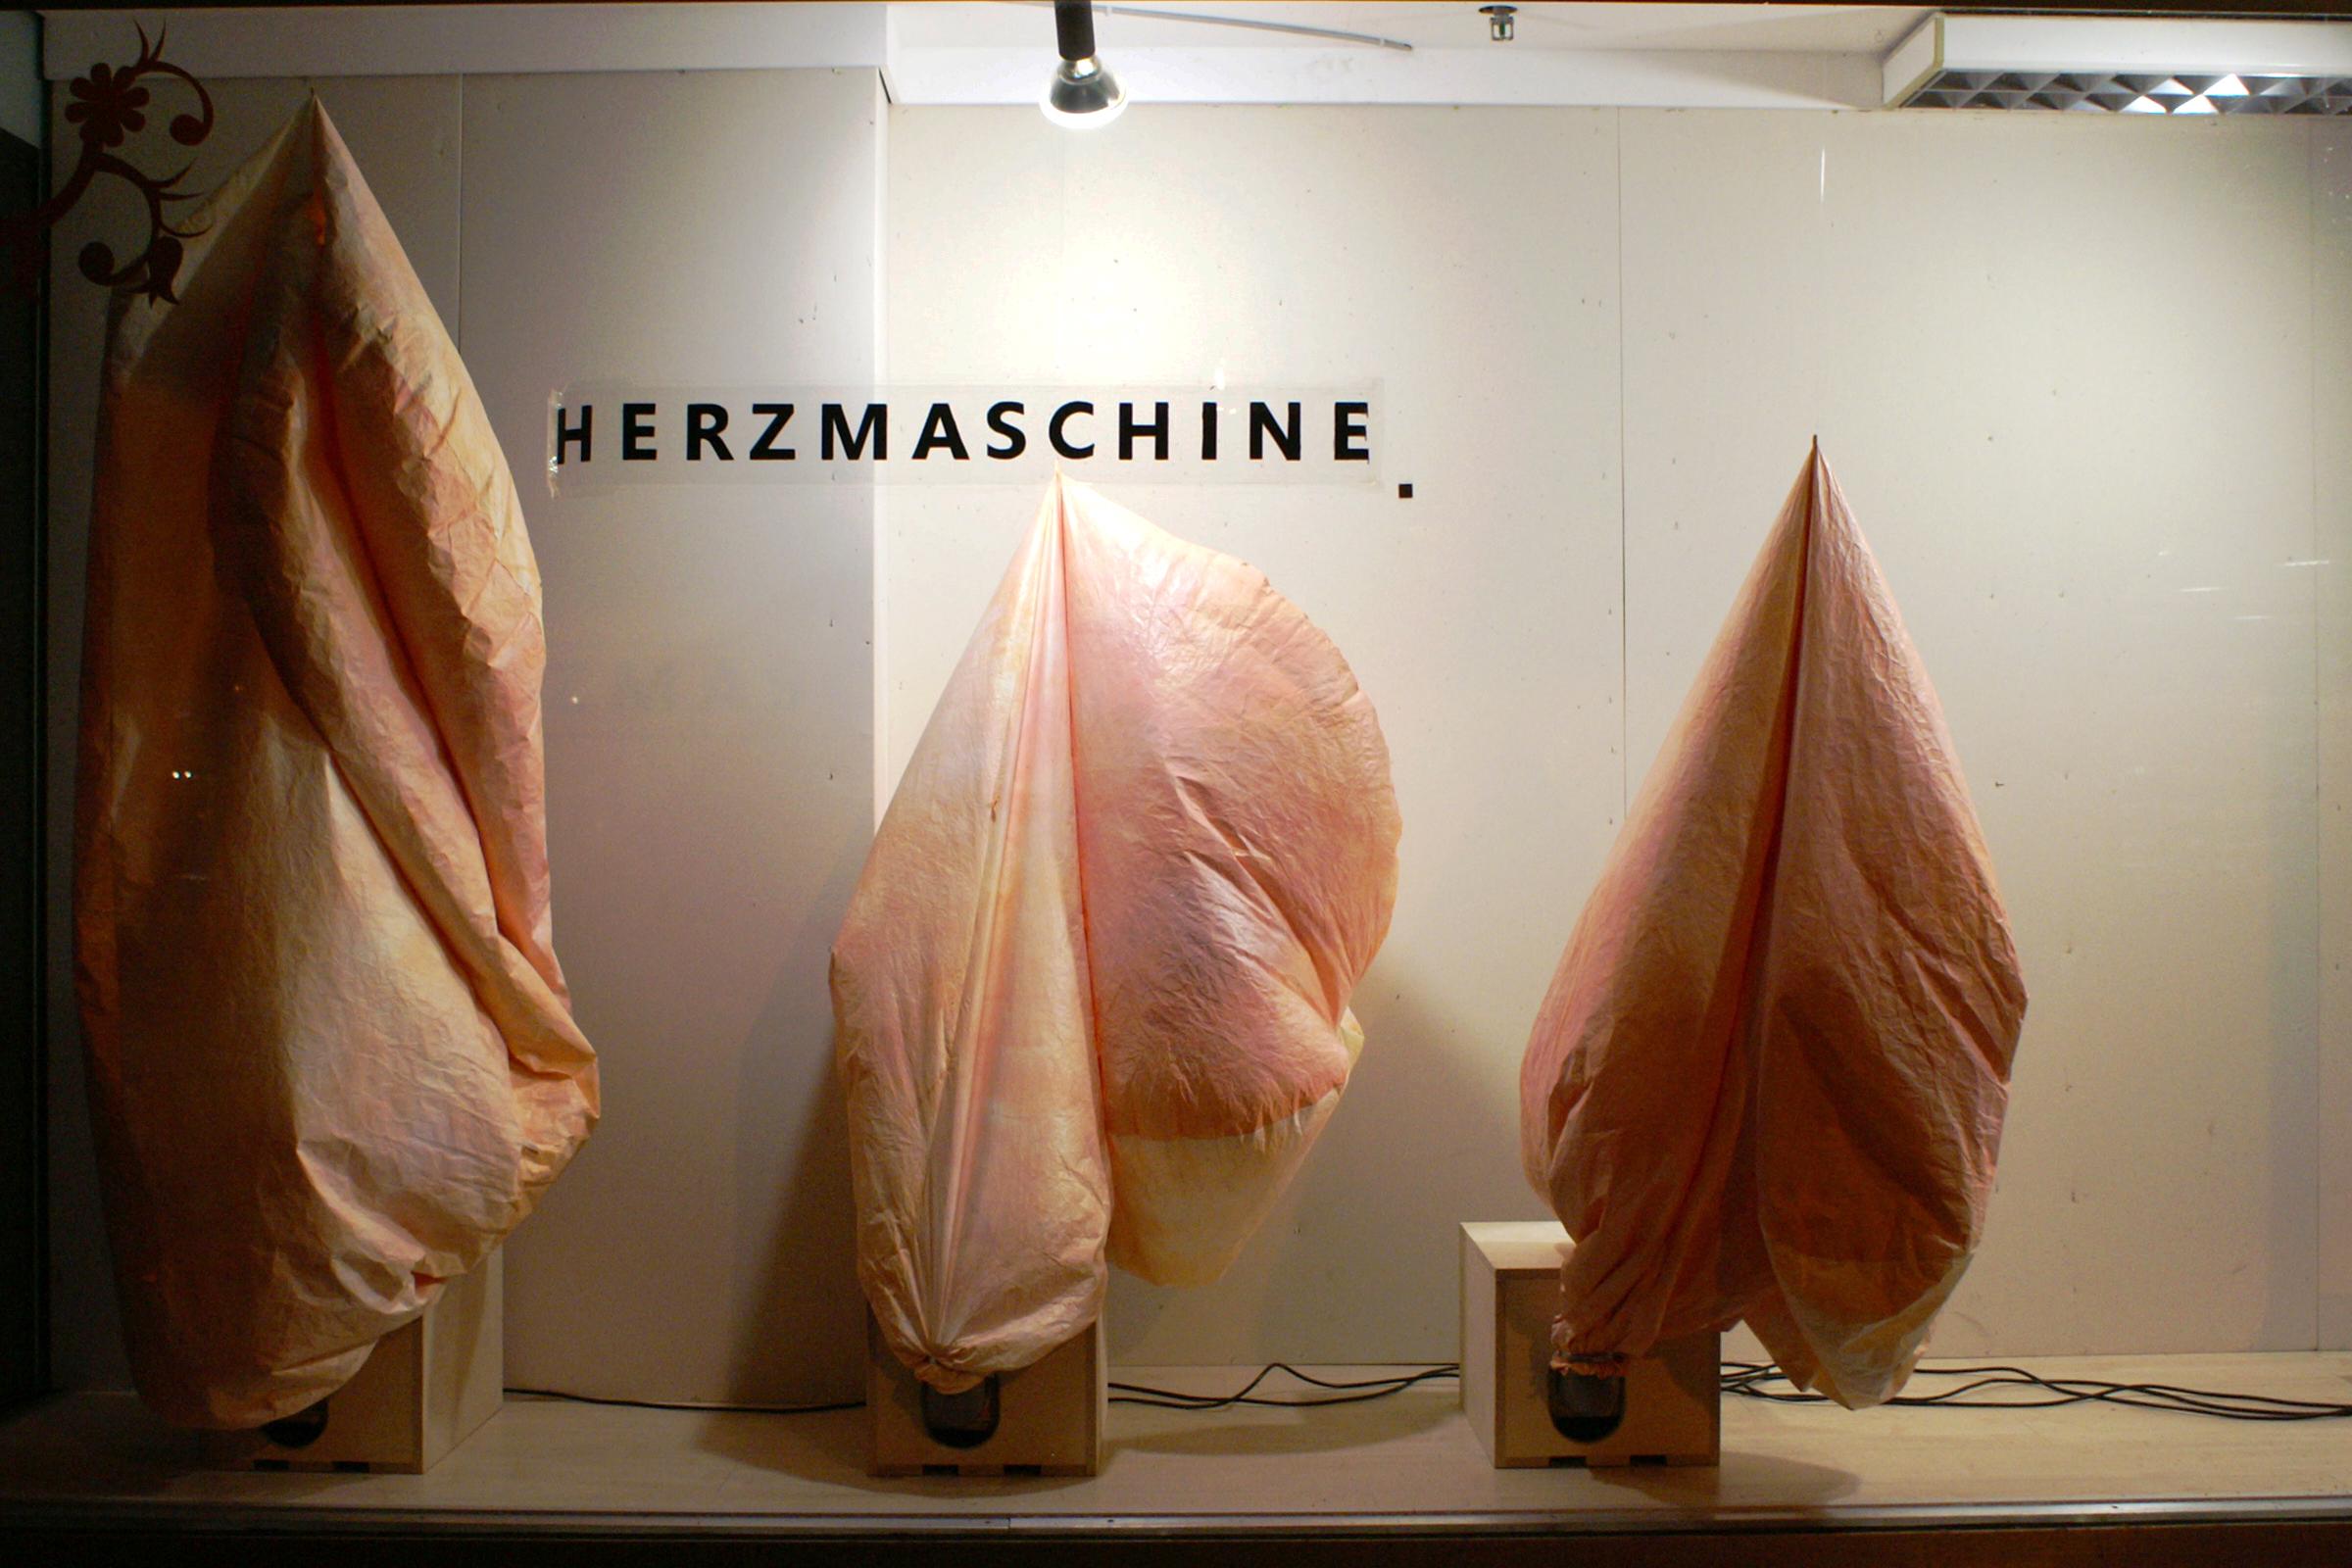 Herzmaschine 2.jpg